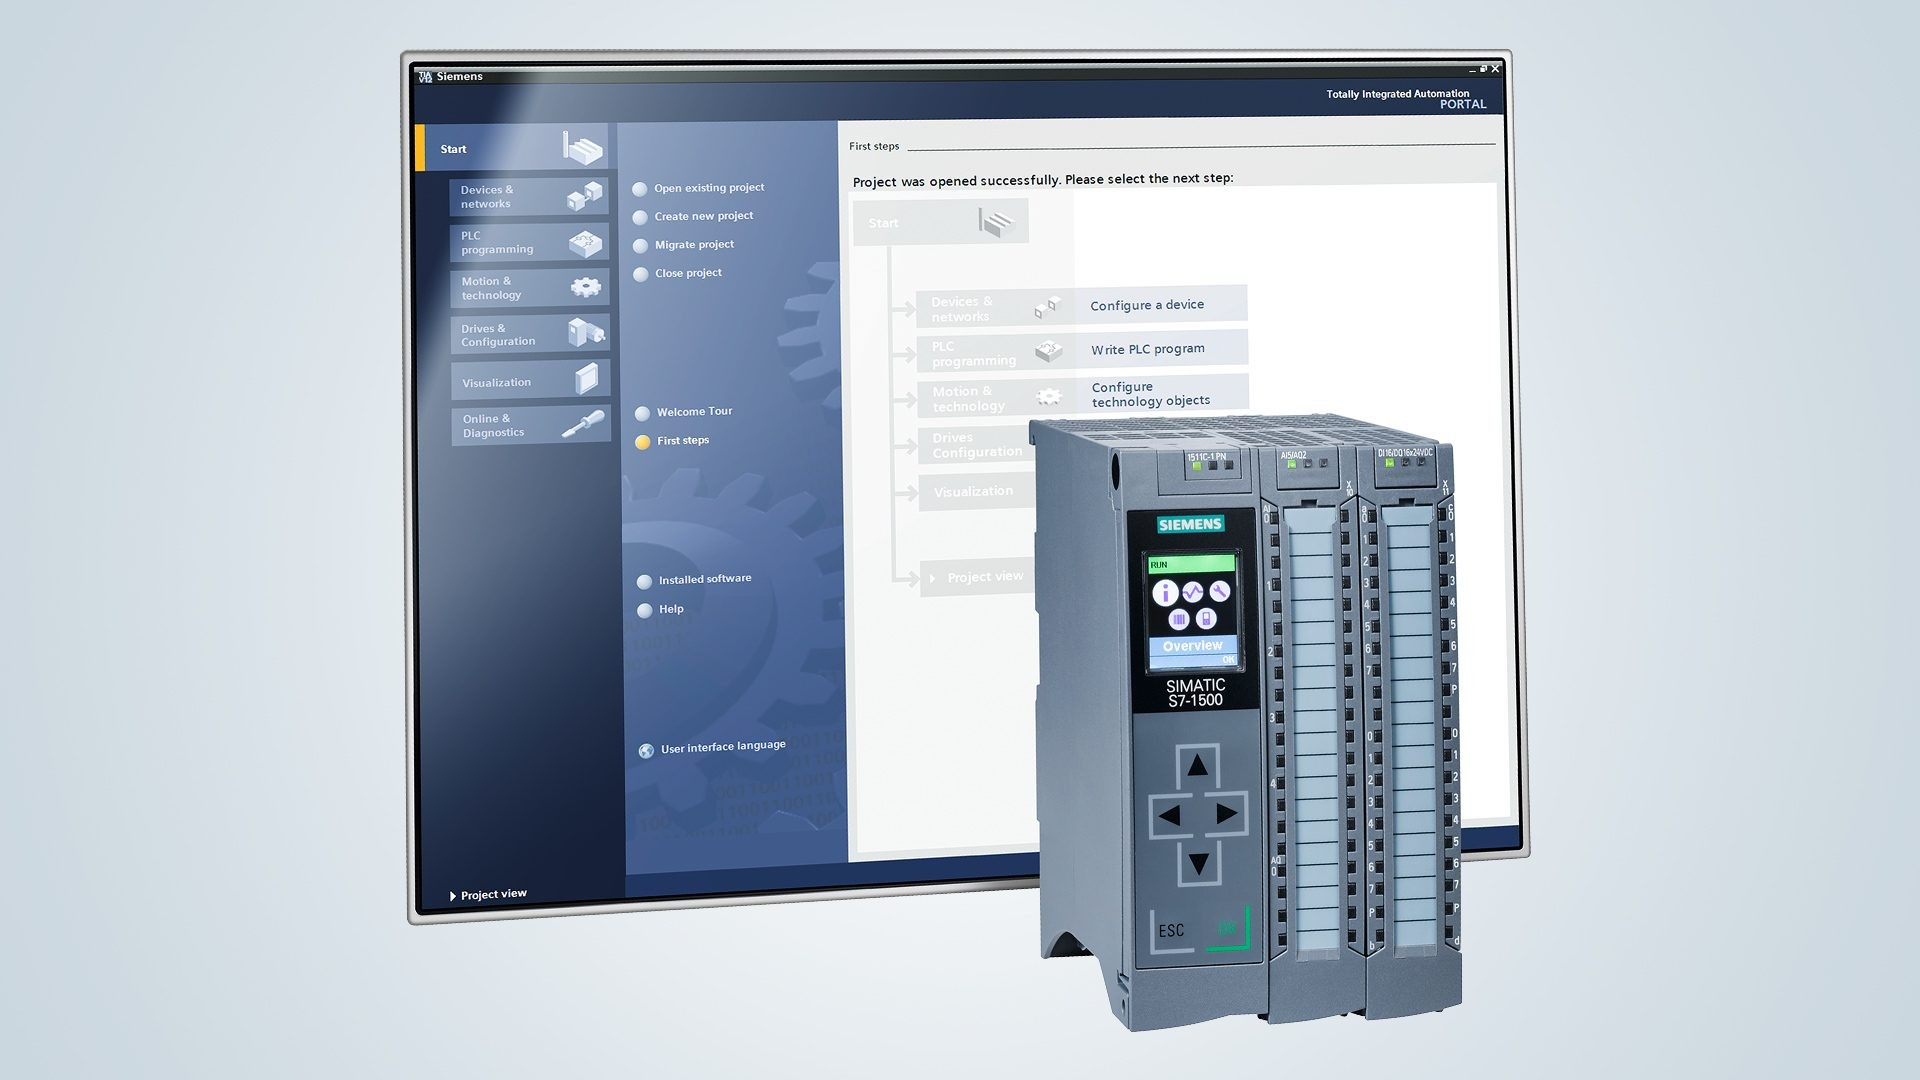 siemens s7 300 plc simulator free download